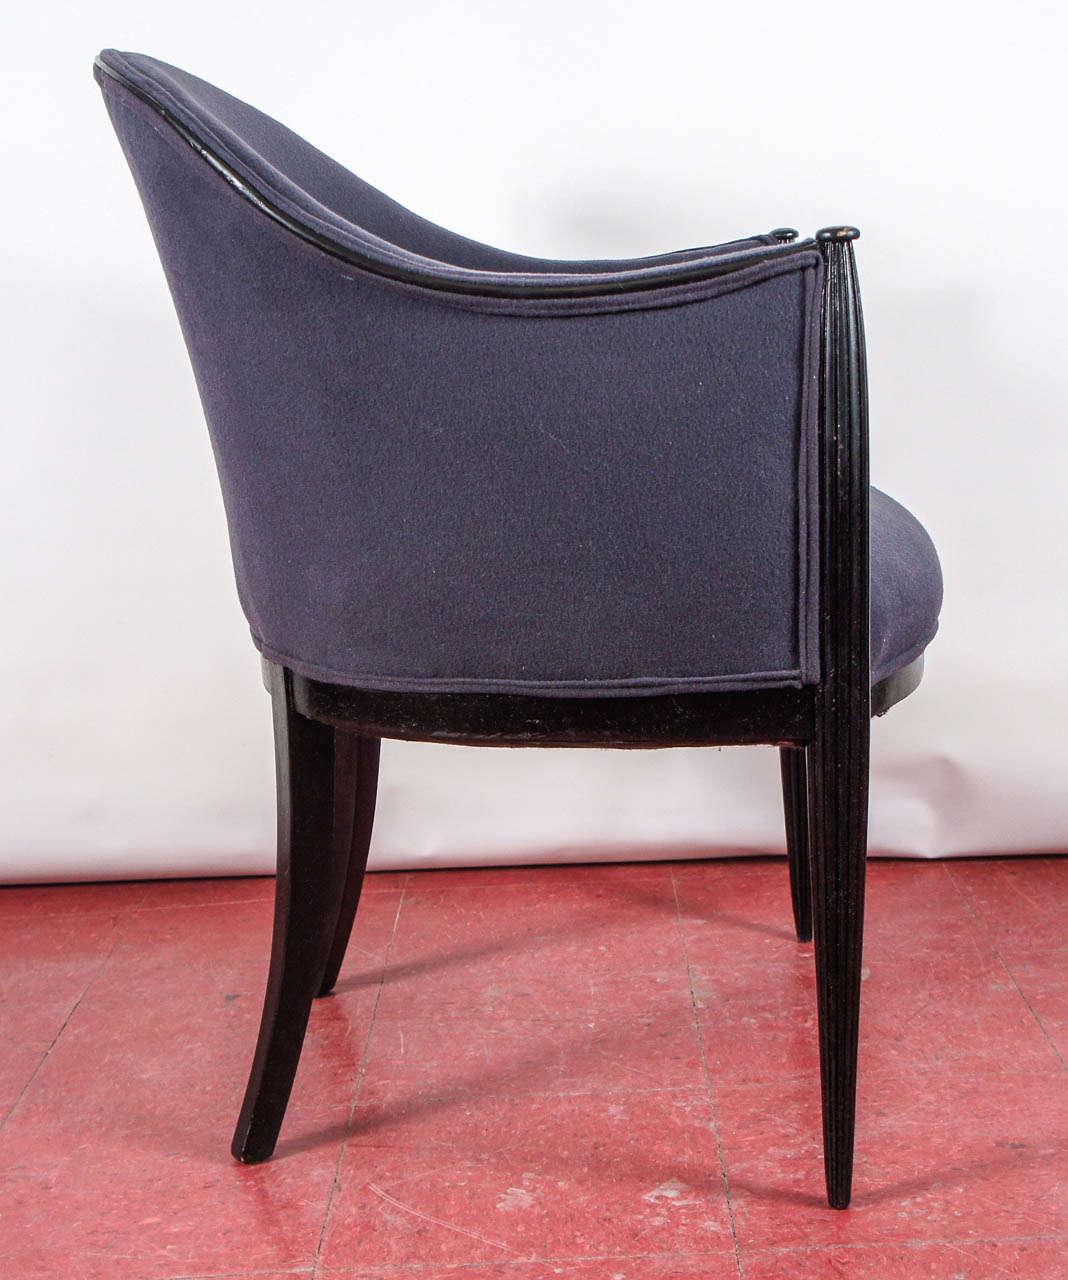 Pair Of Rhulmann Or Paul Follot Style Chairs--Priced Per